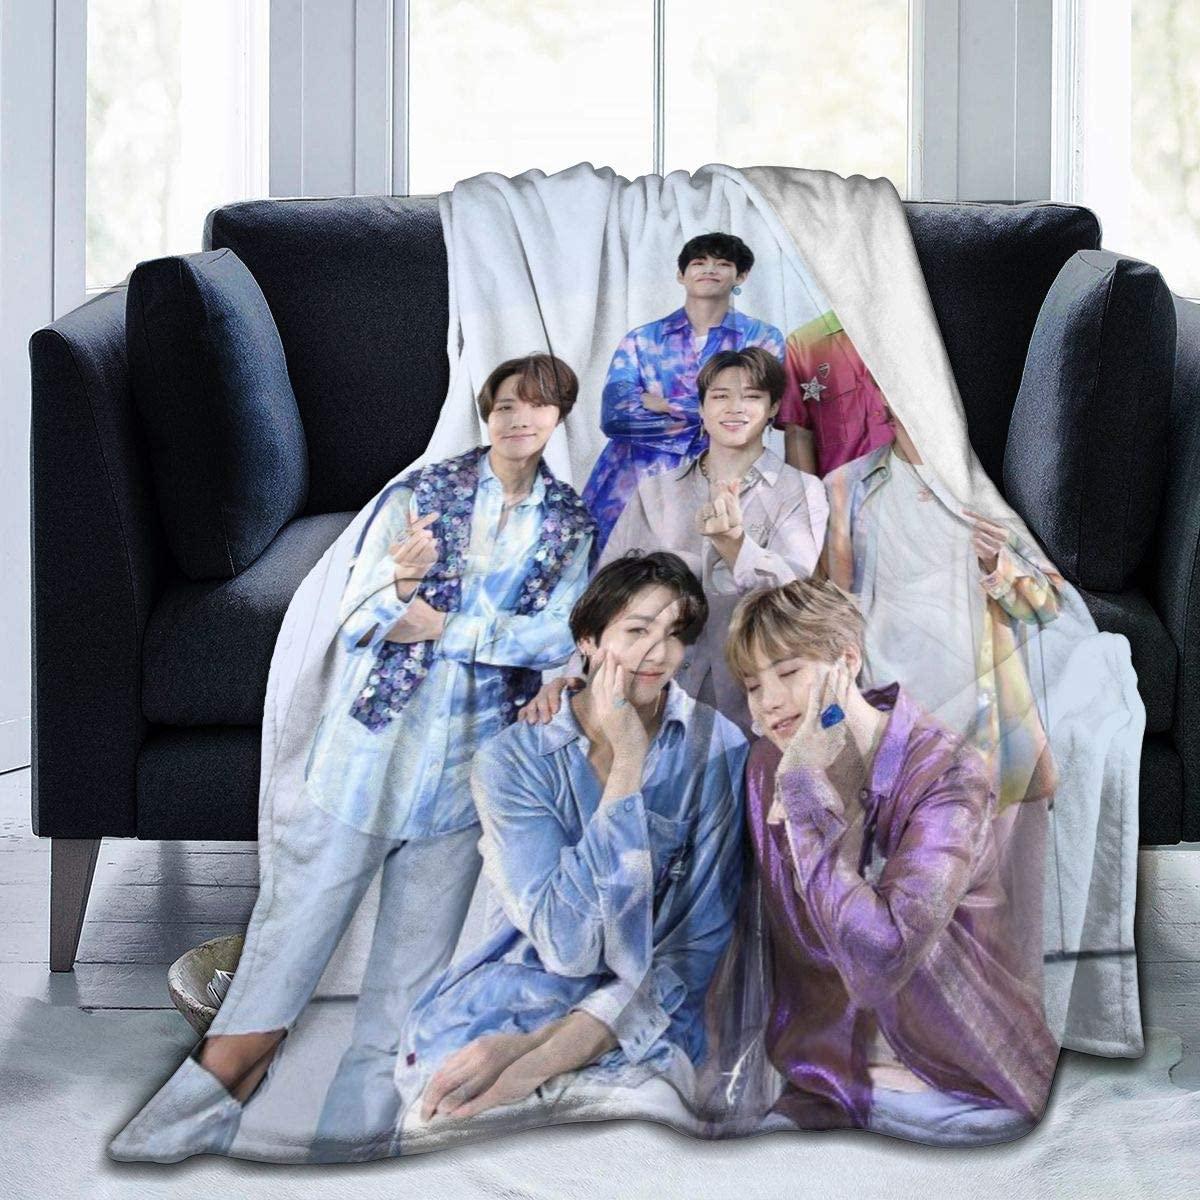 HOJJP Jimin J-Hope Ultra-Soft Micro Cozy Plush Sofa Throw Blanket Lightweight Bed Blanket 50x40 Inch